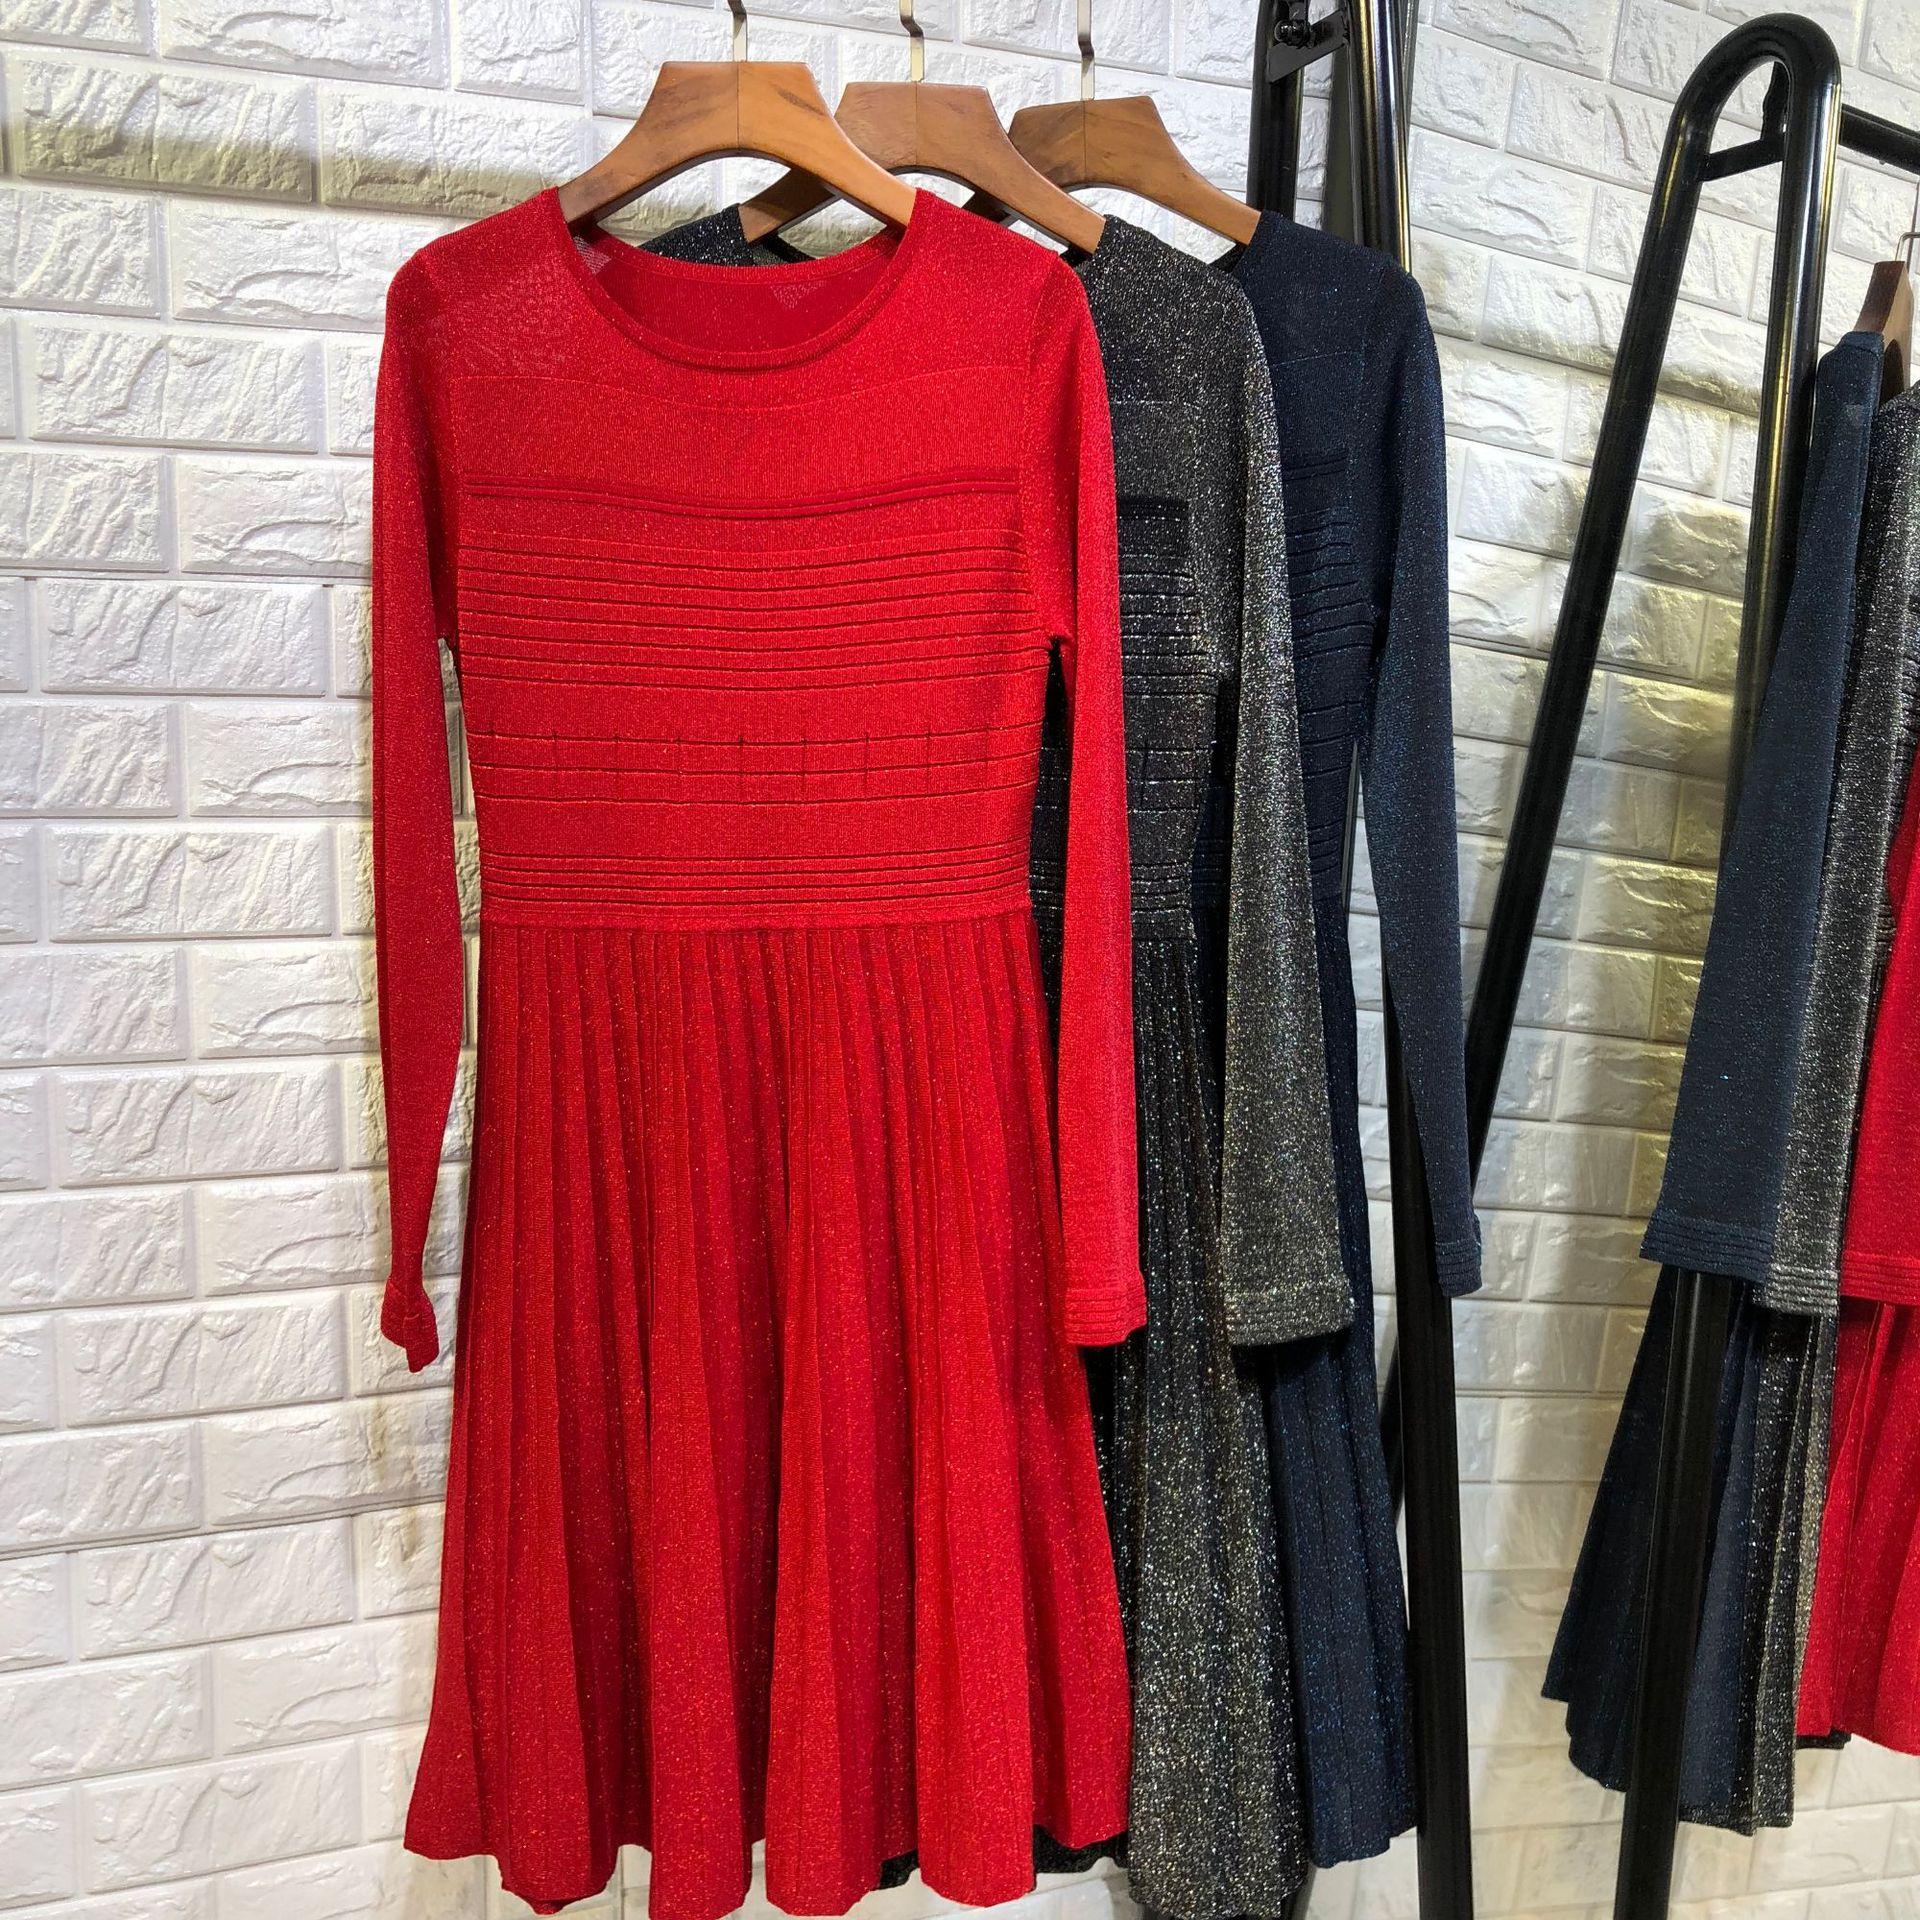 f8b951c1578 Women fashion elegant lurex knit sweater dress long sleeve jacquard fit and  flare christmas dresses new